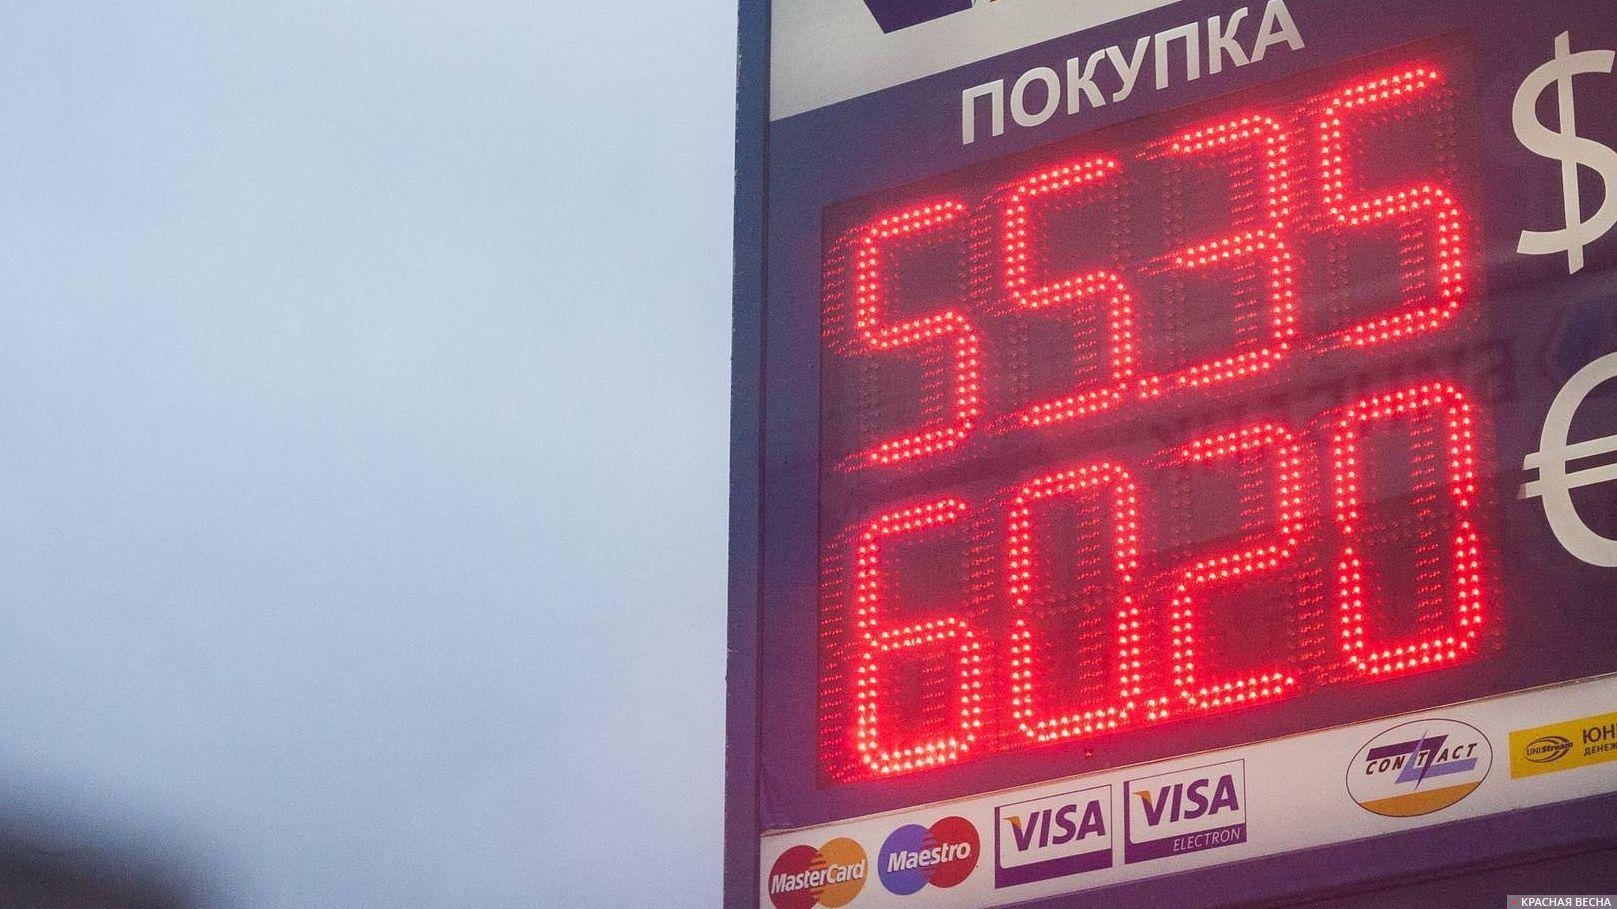 Табло пункта обмена валюты